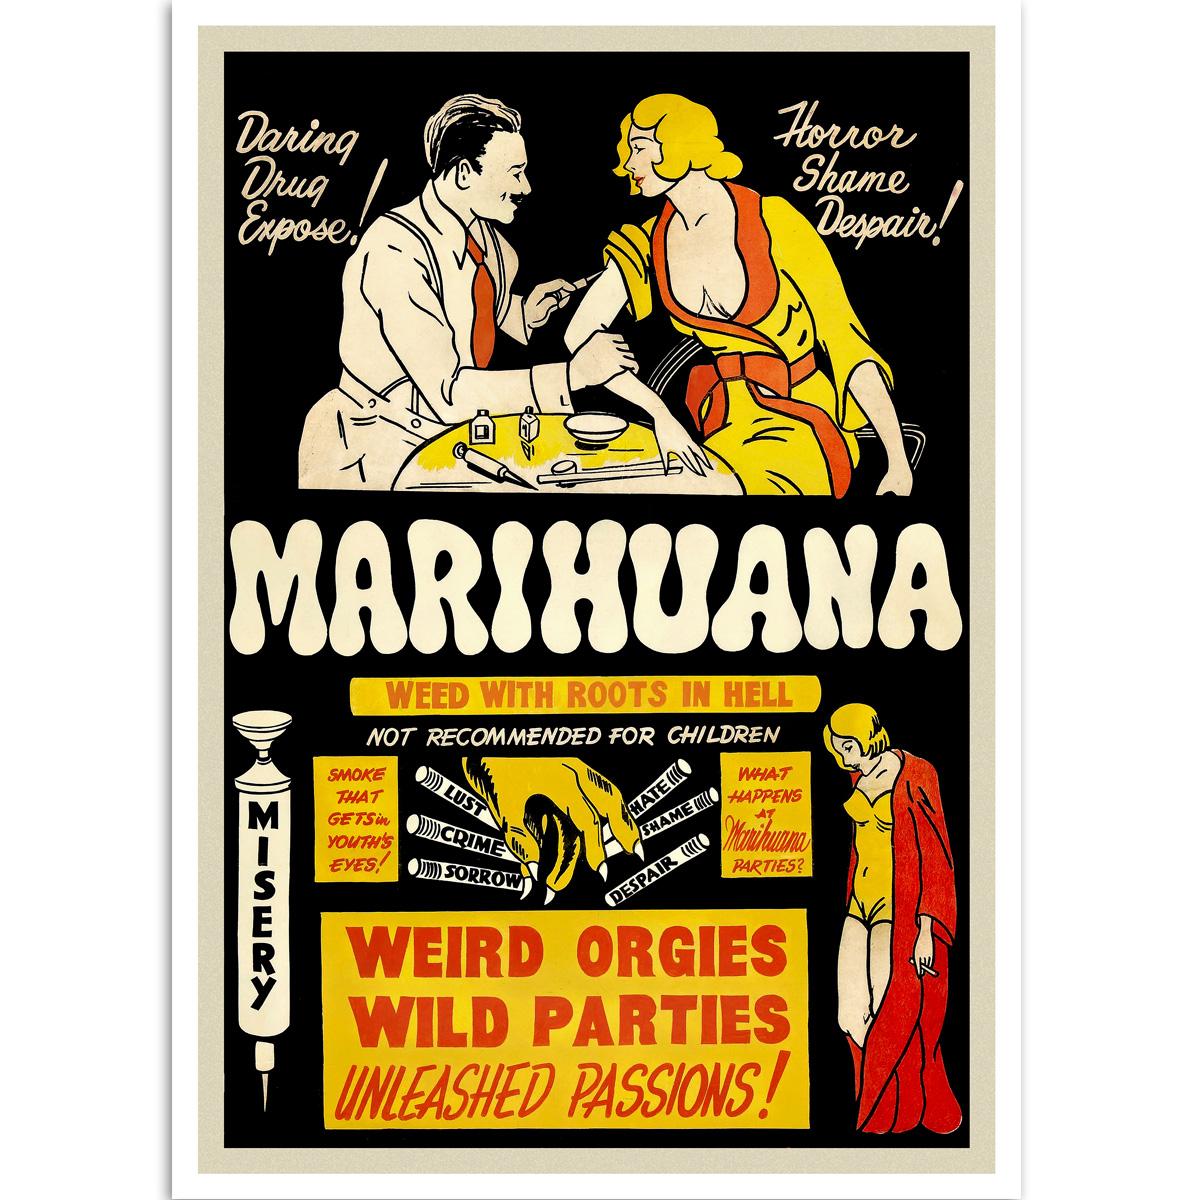 Vintage Propaganda Poster - Marihuana - Root From Hell